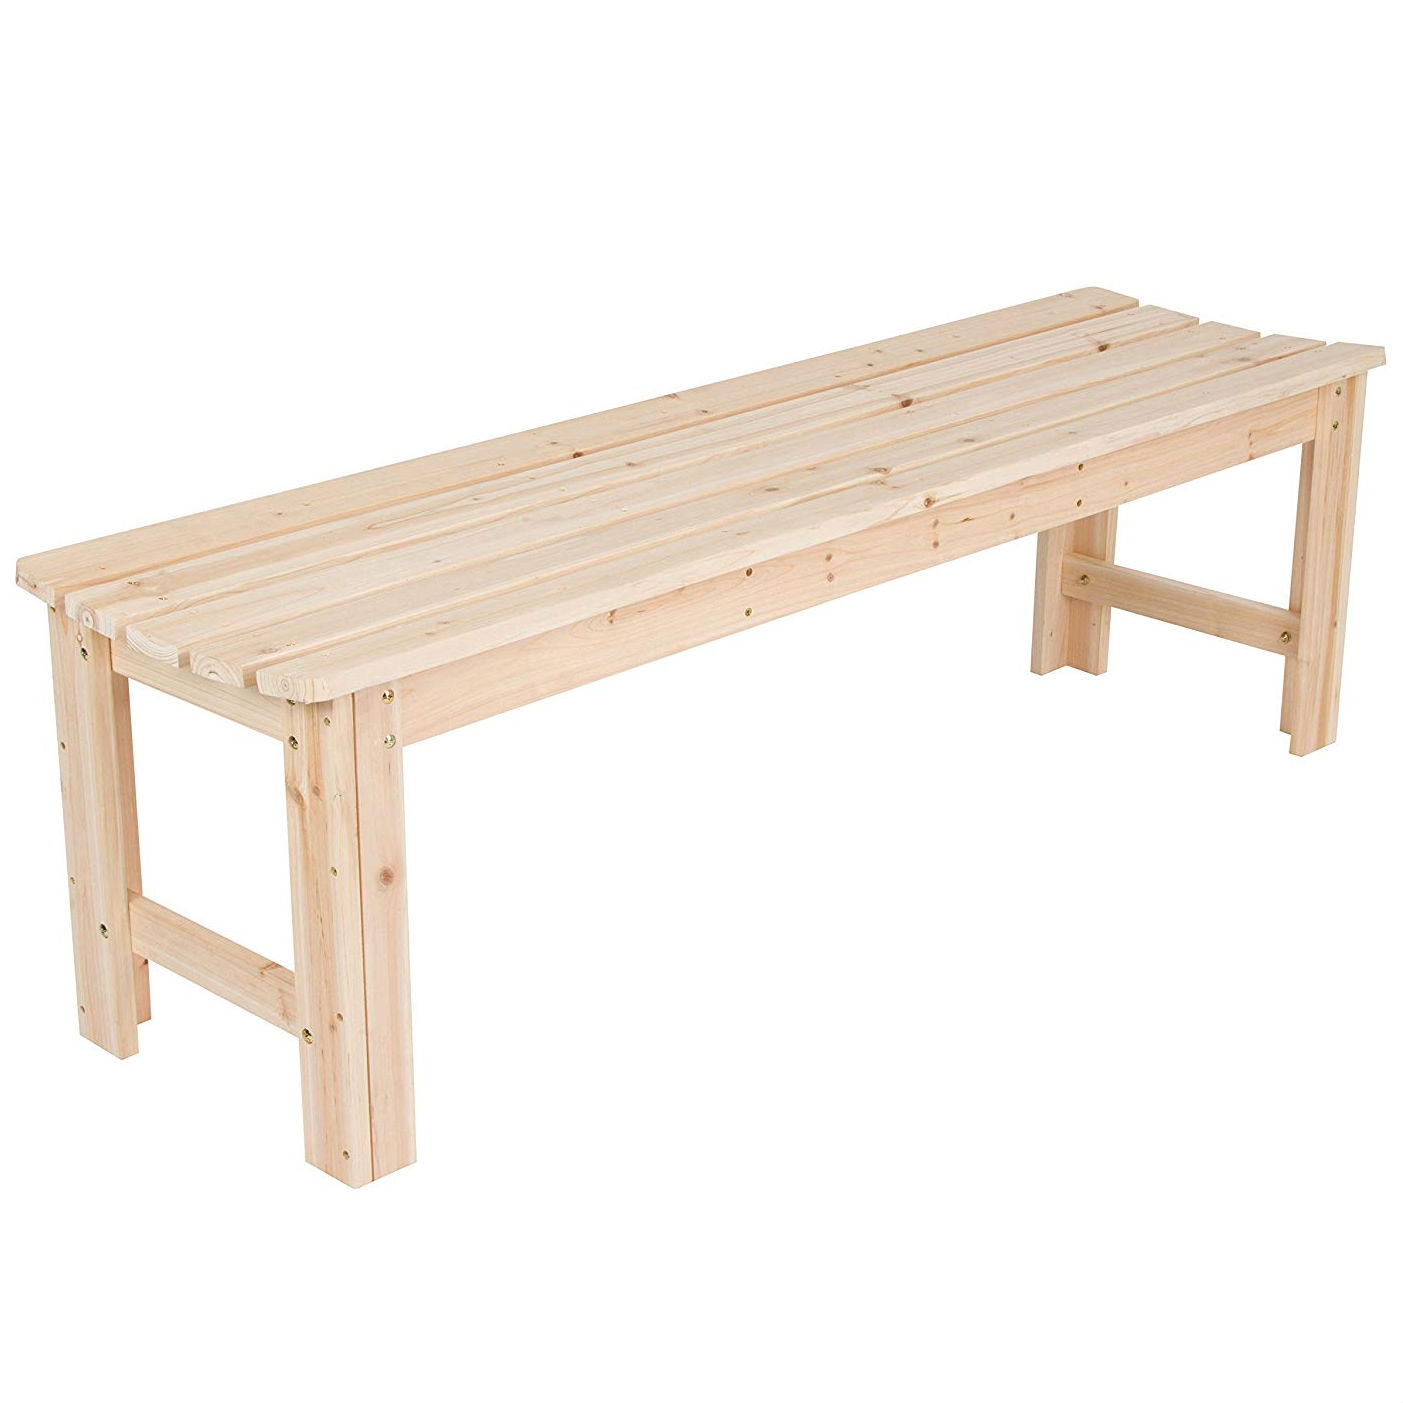 Ordinaire 5 Ft Backless Garden Bench In Natural Yellow Cedar Wood